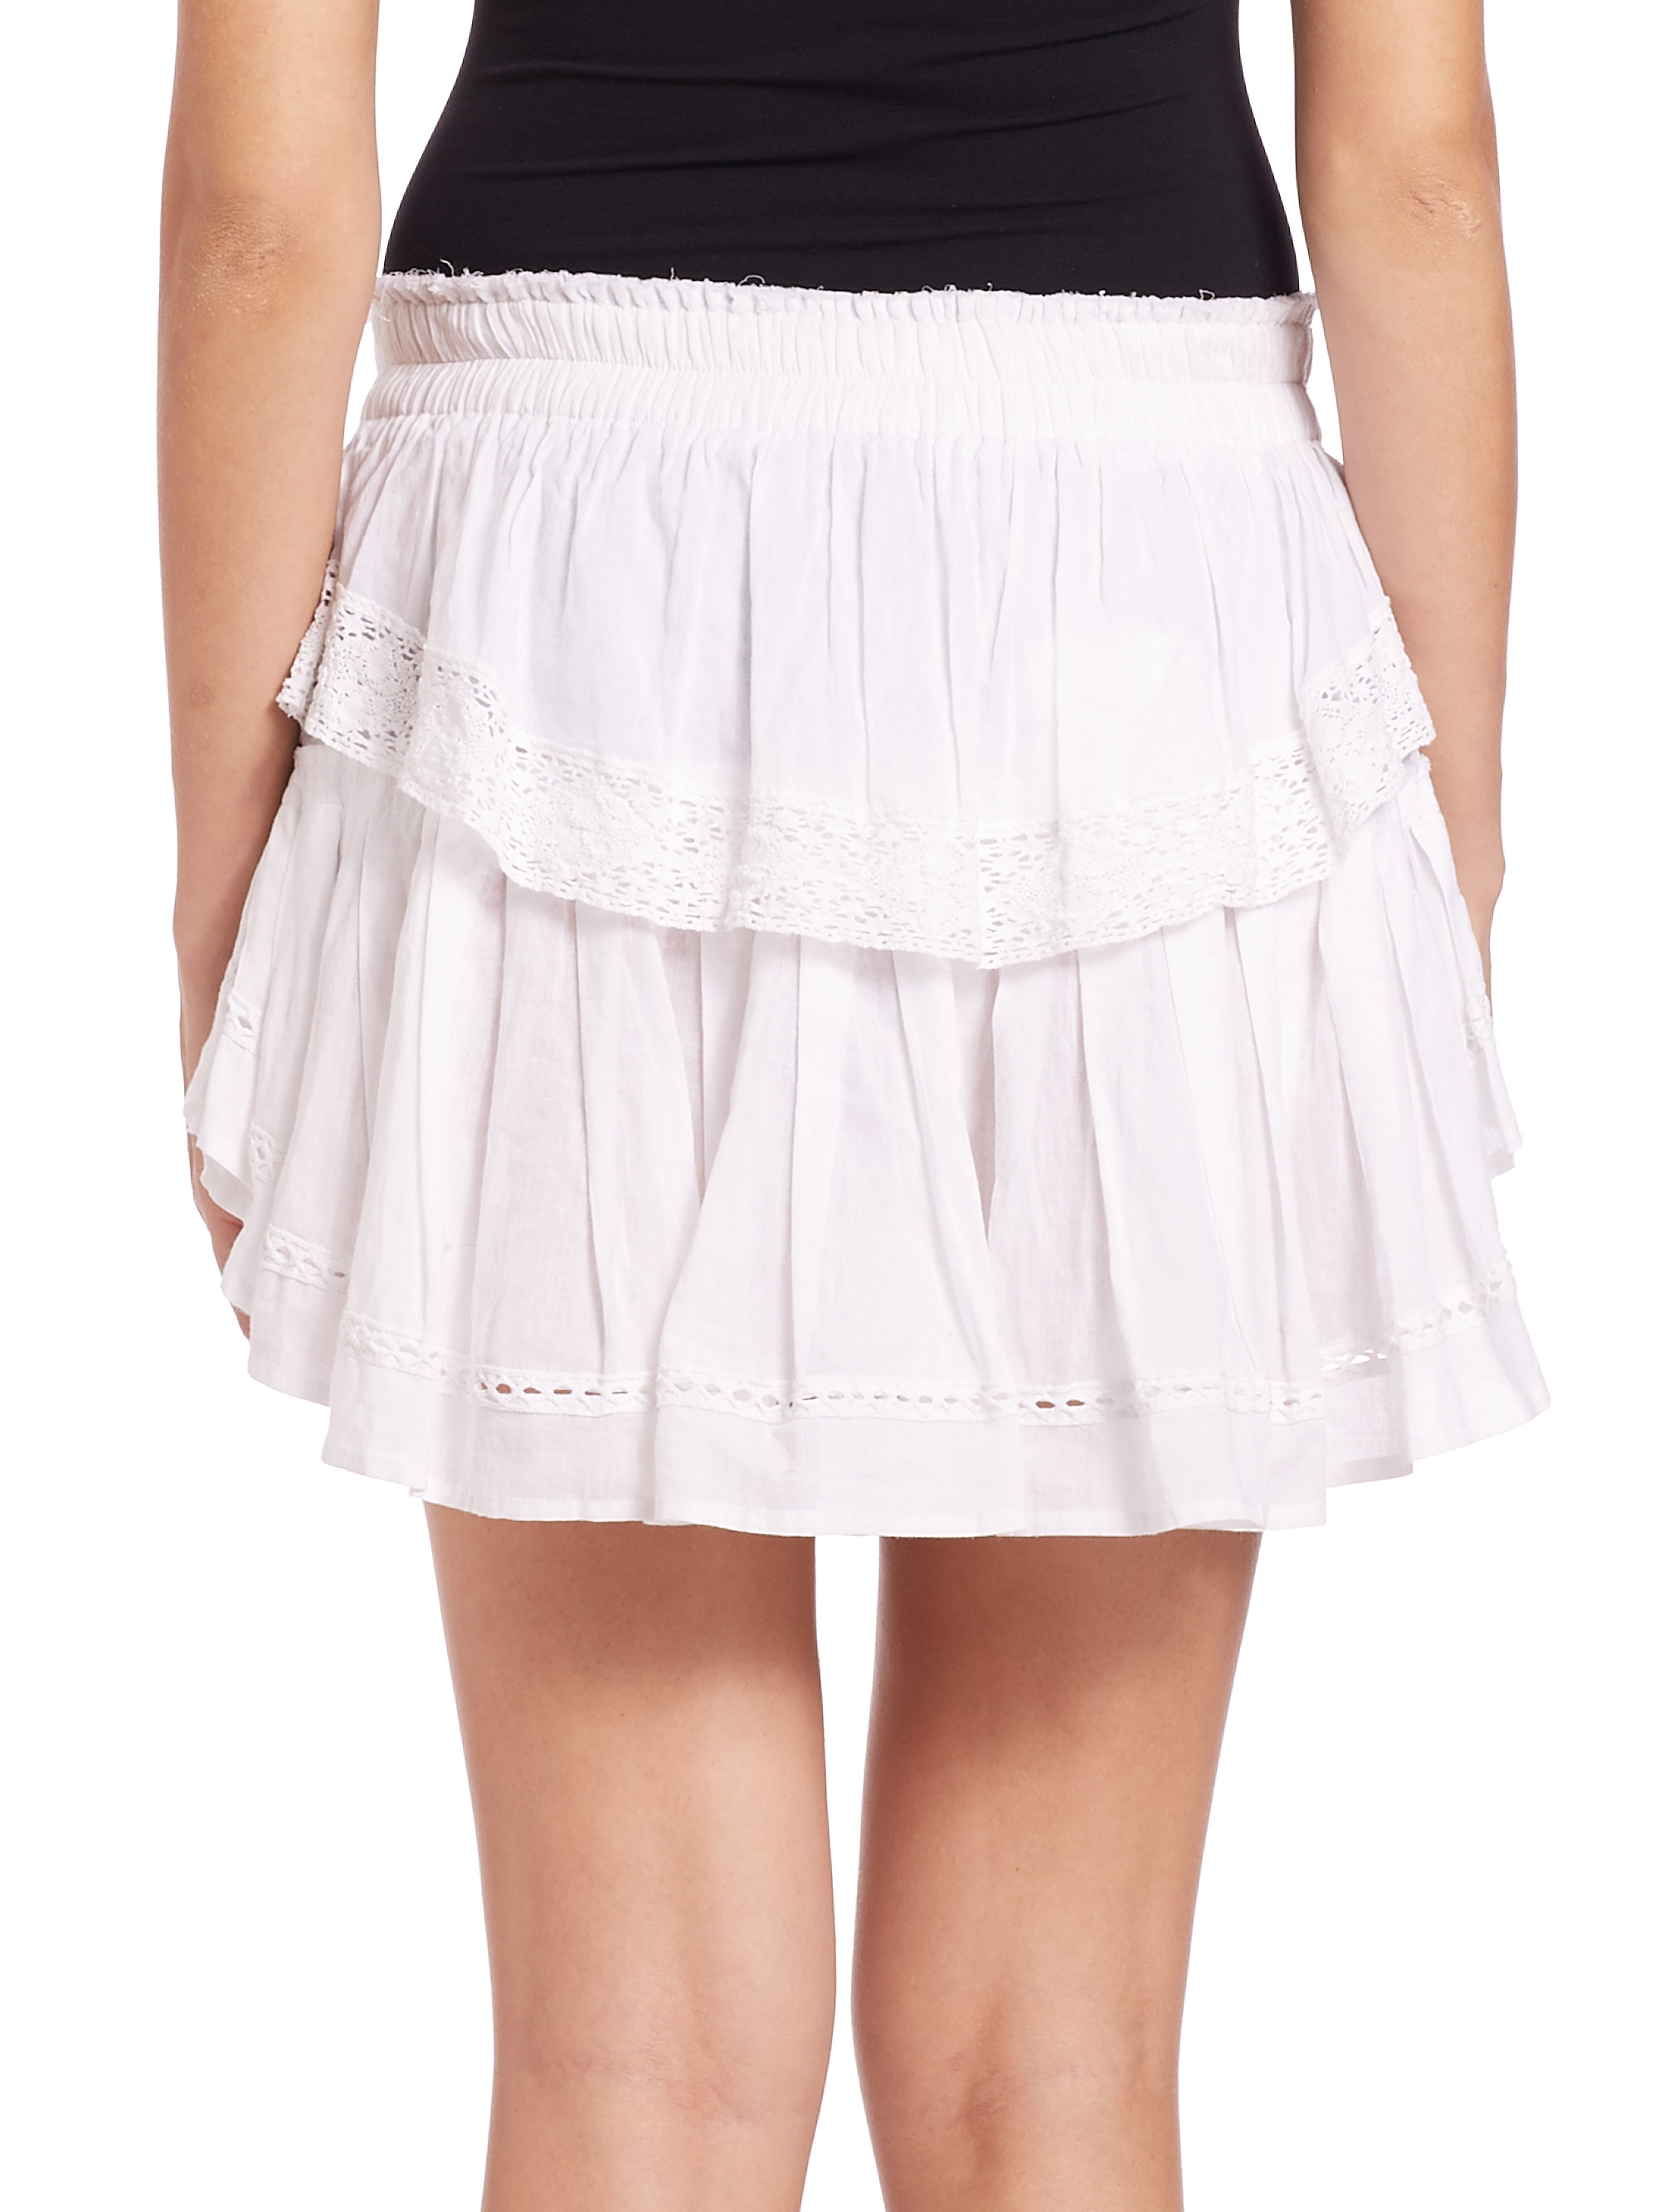 0bed605e9 LoveShackFancy Cotton Ruffle Skirt in White - Lyst